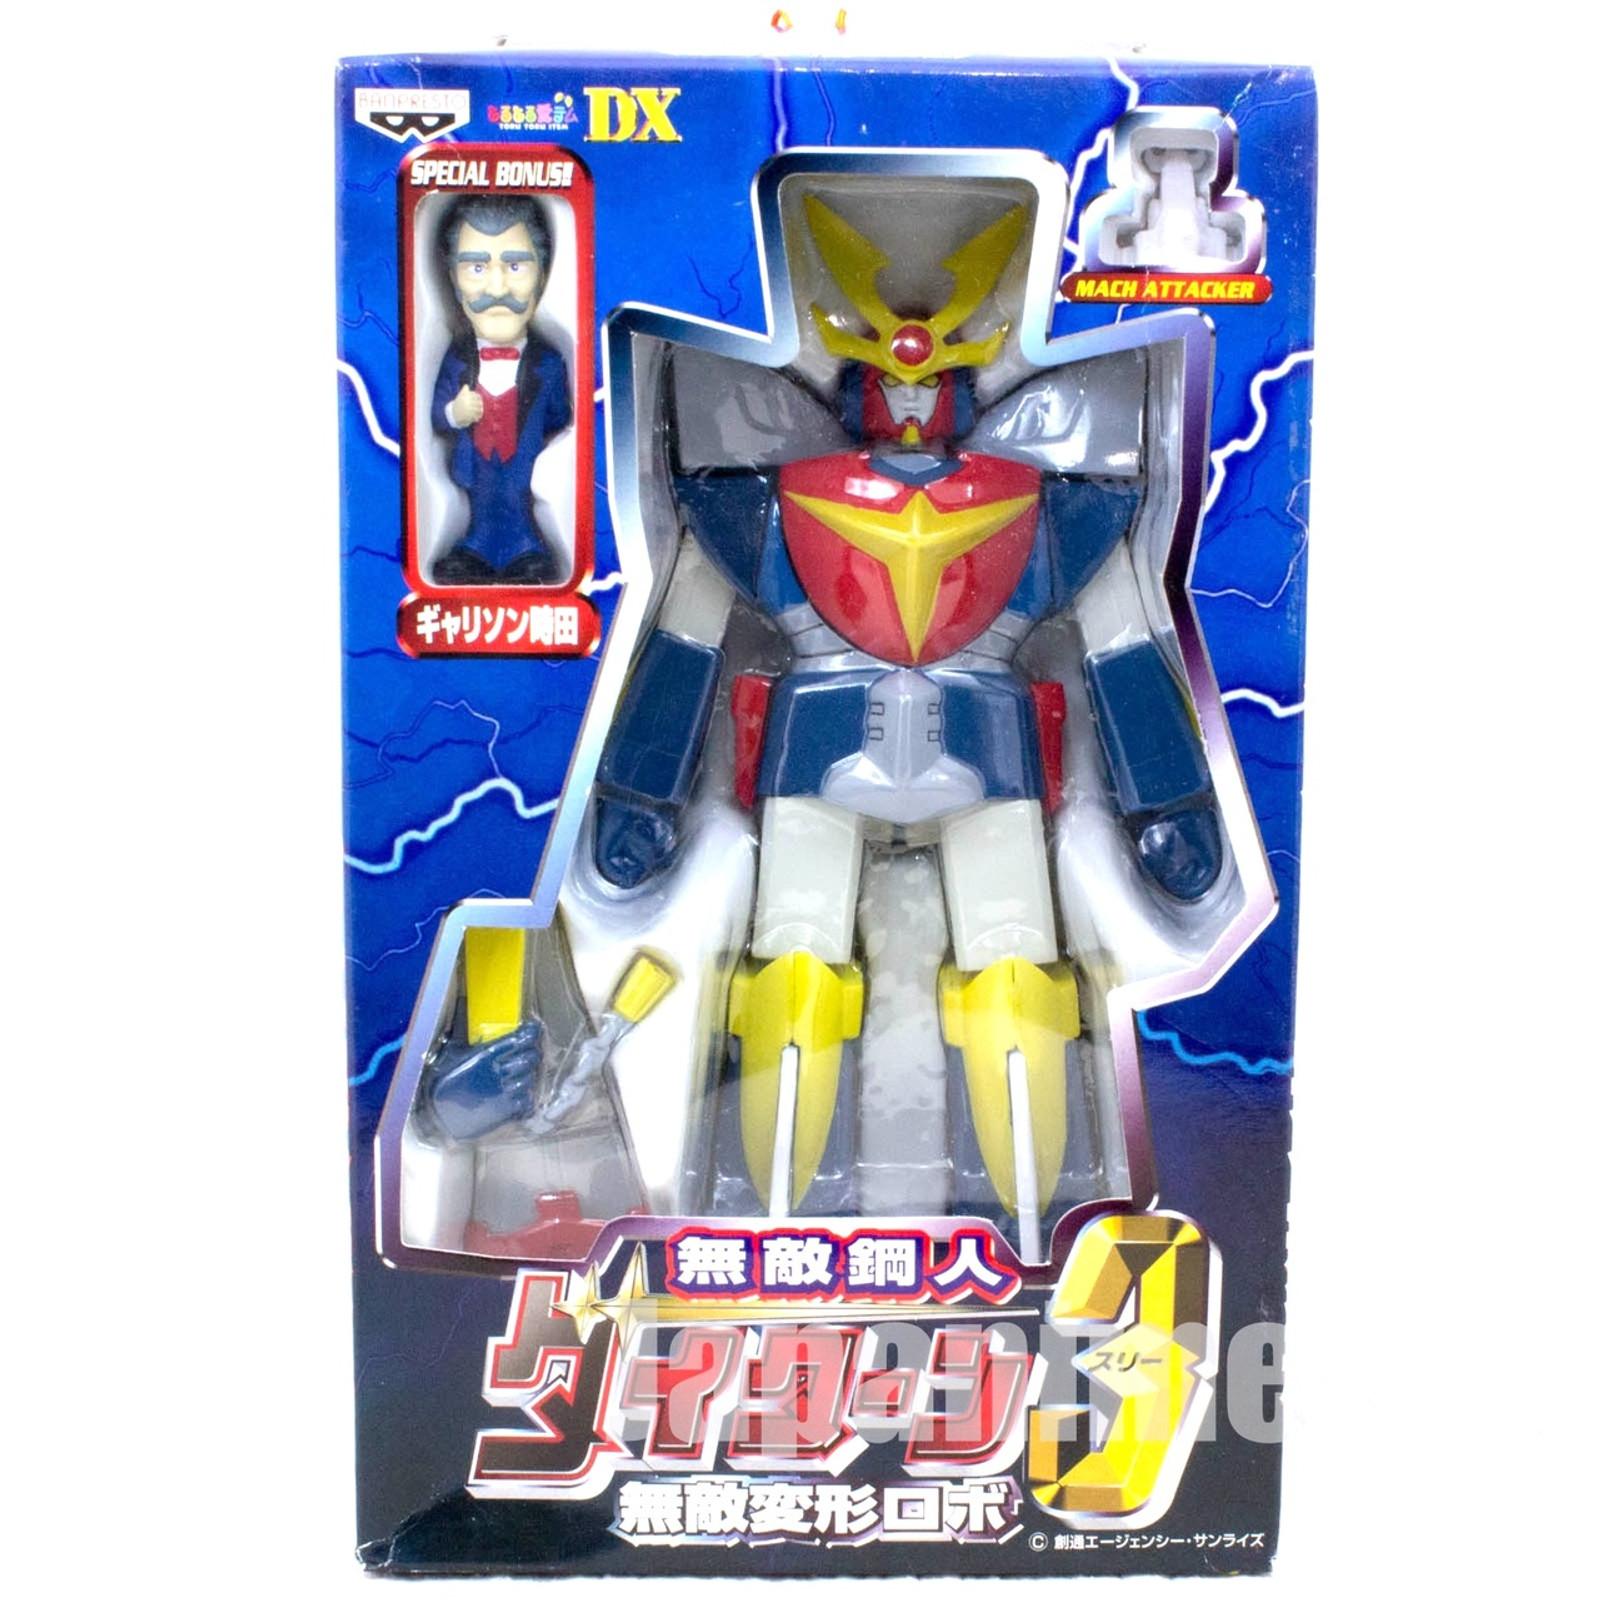 Invincible Steel Man Daitarn 3 Deformable Figure Garrison Tokita Set JAPAN ANIME